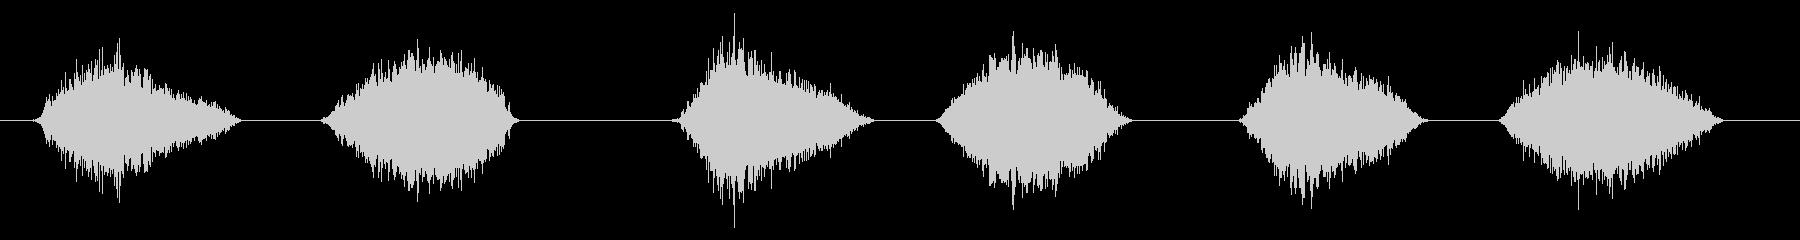 PC マウス ムーブ03-09(ソフト)の未再生の波形